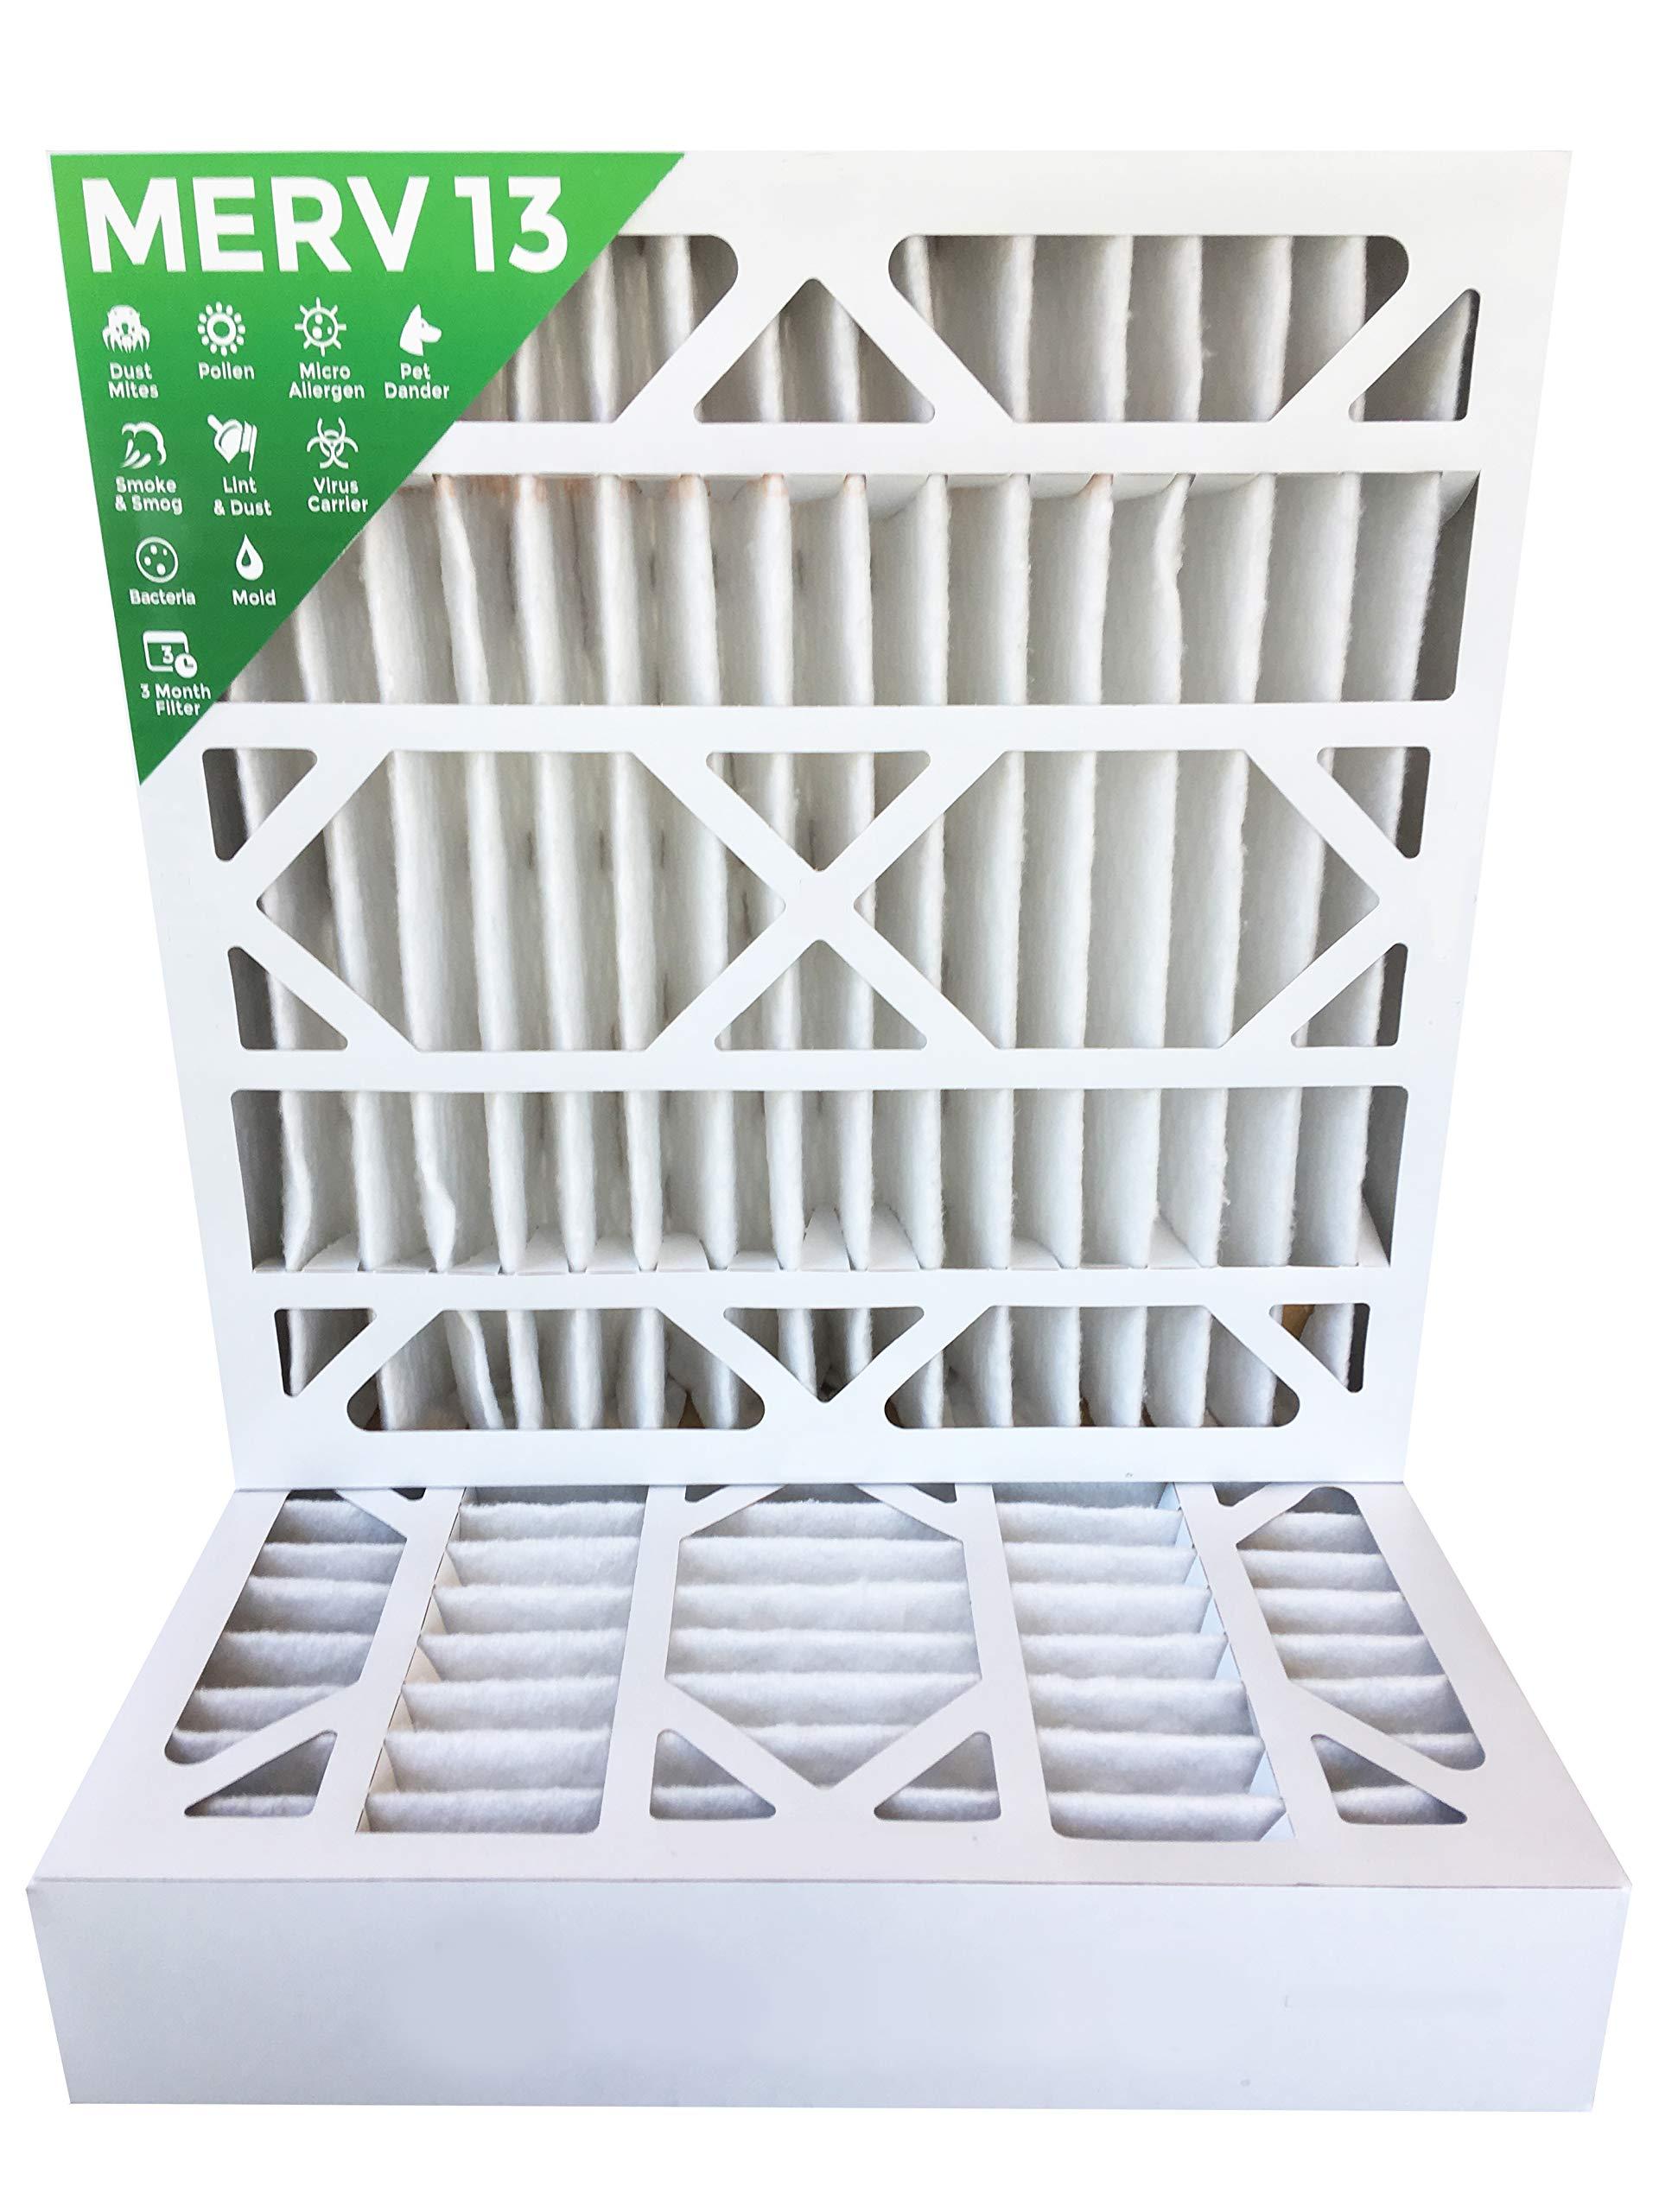 20x20x4 MERV 13 AC Furnace 4'' Inch Air Filters. 2 Pack